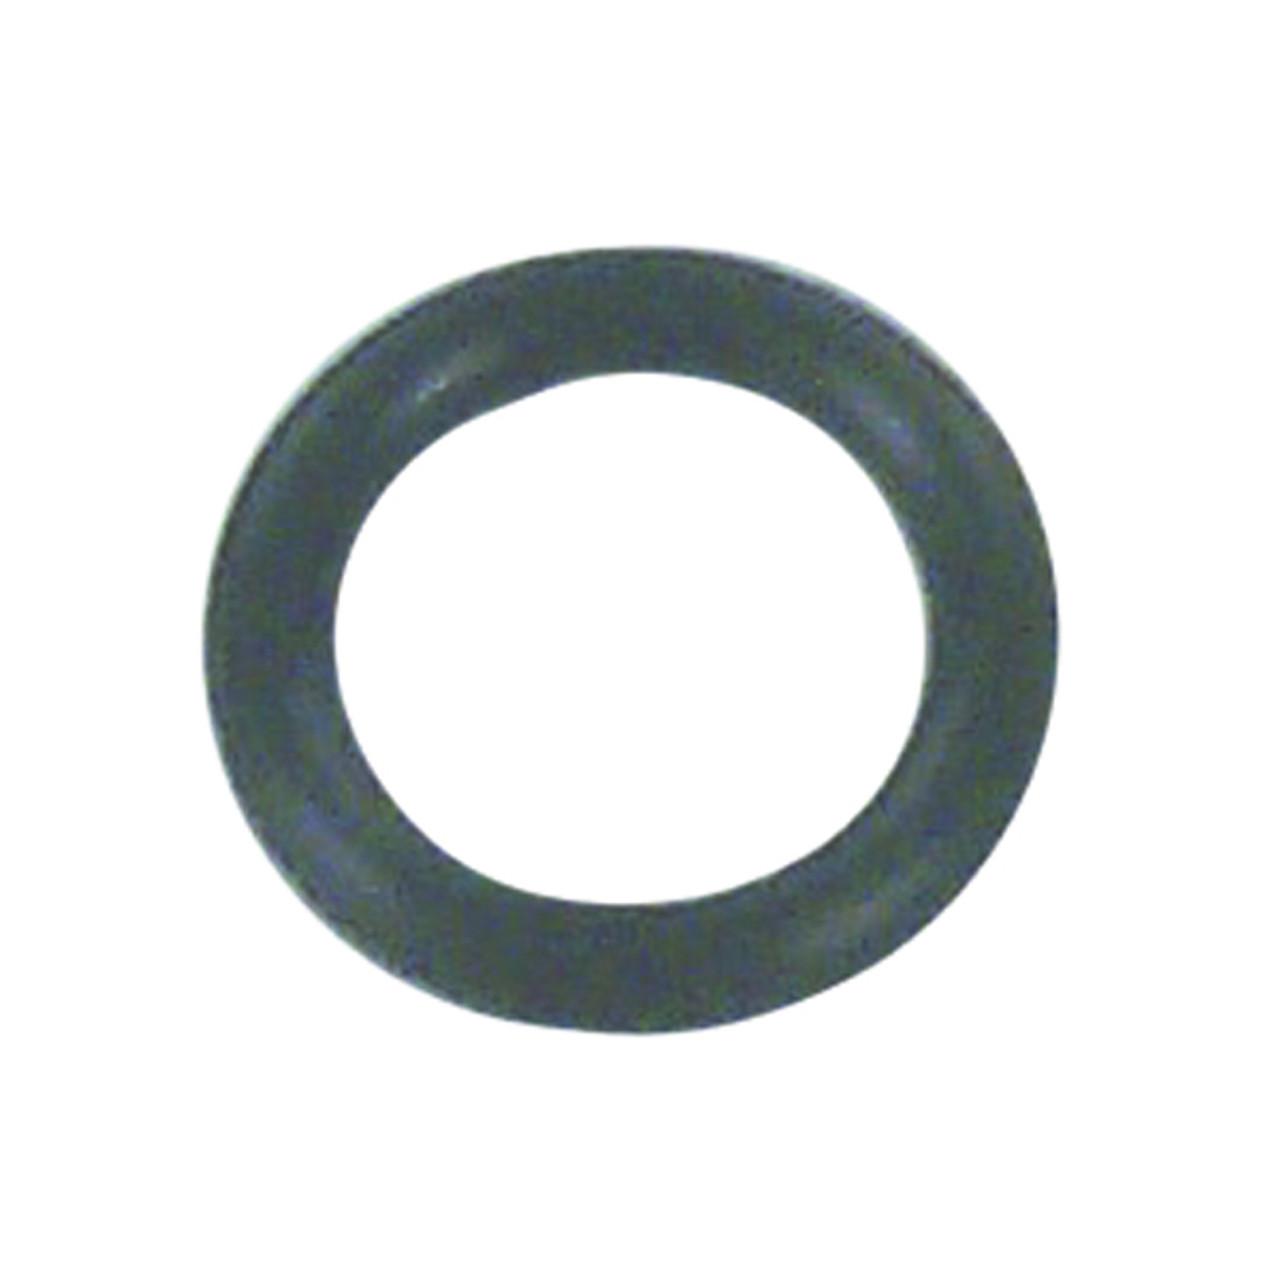 Evinrude Johnson OMC Engine Part O RING /& 0336982 336982